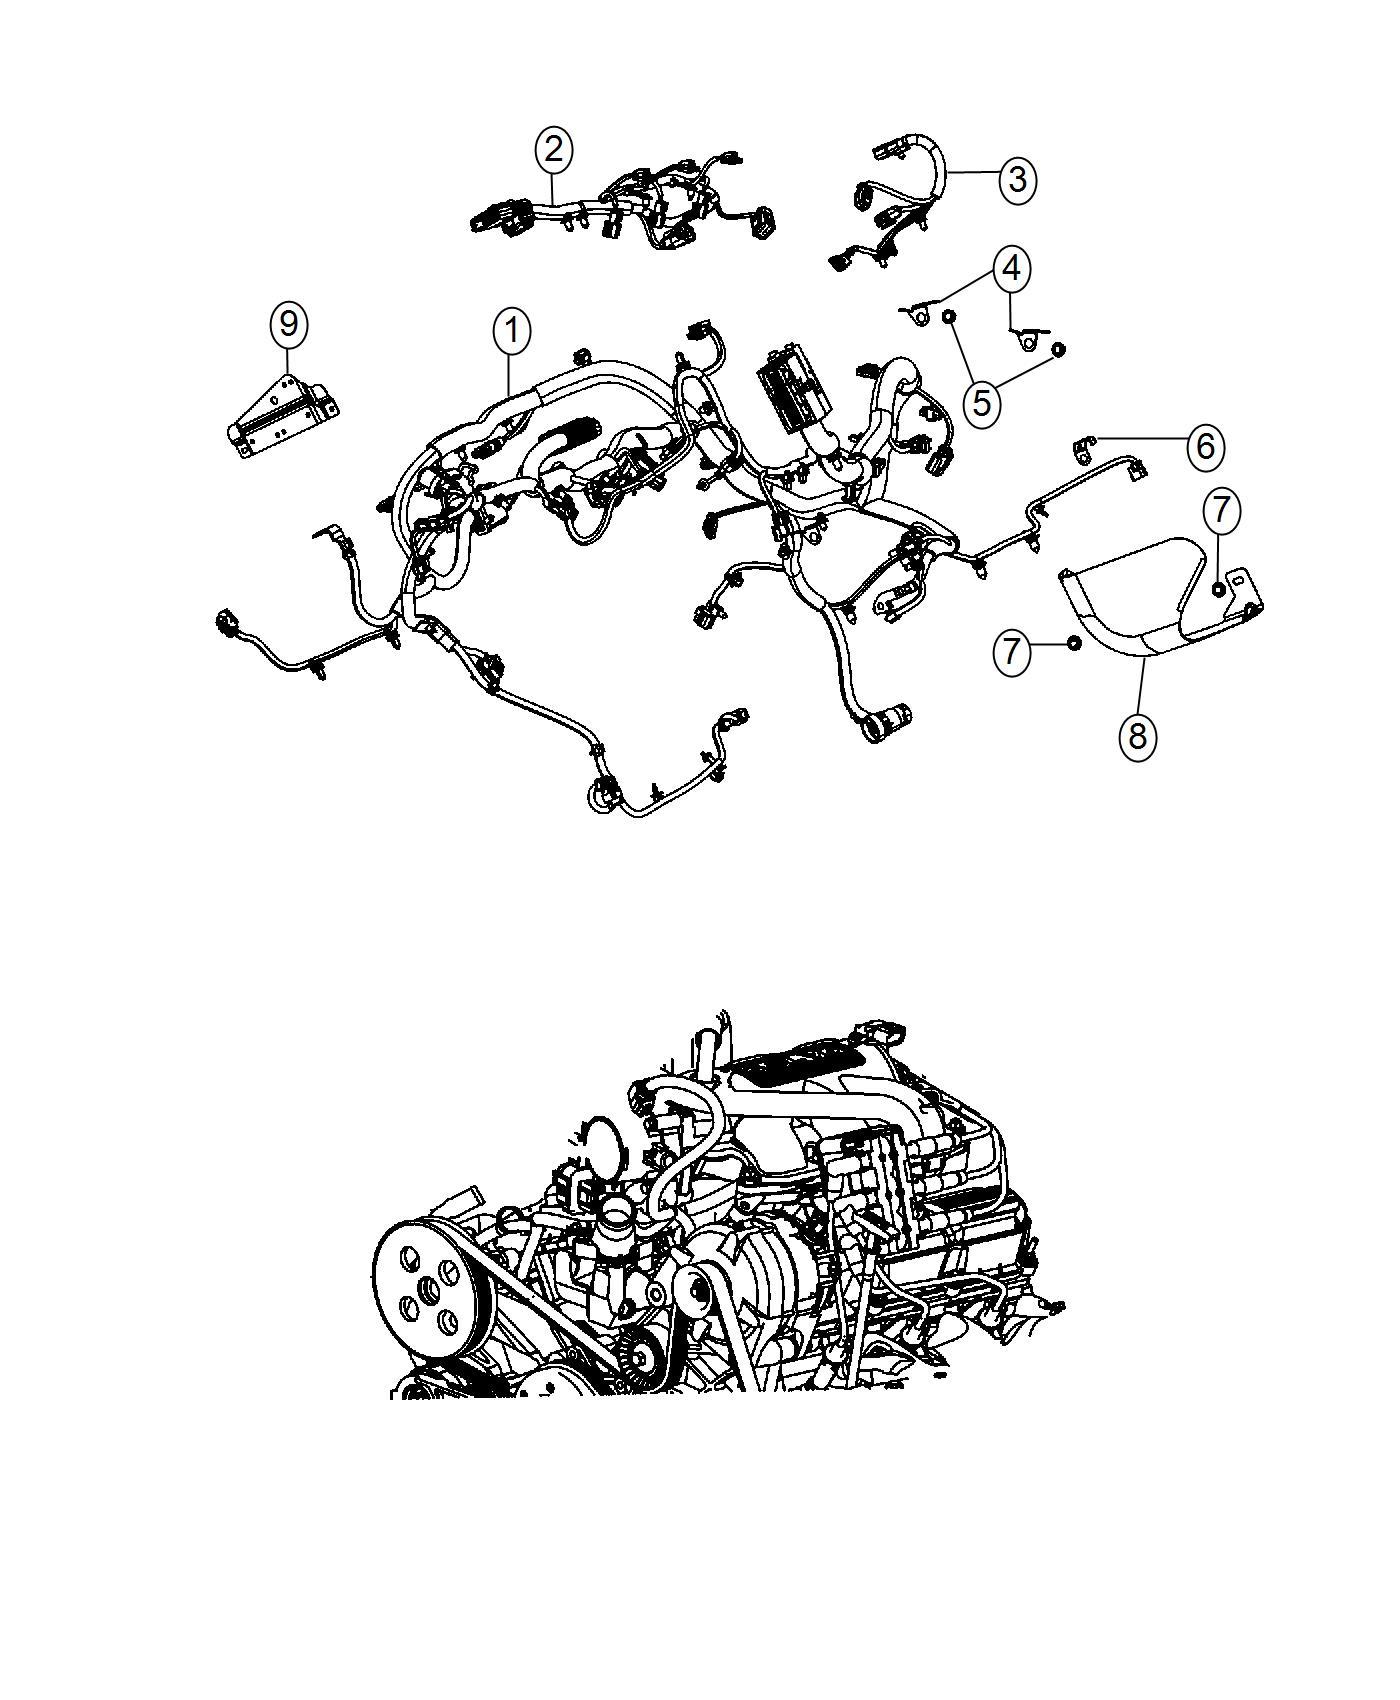 chrysler 3 6 pentastar engine diagram